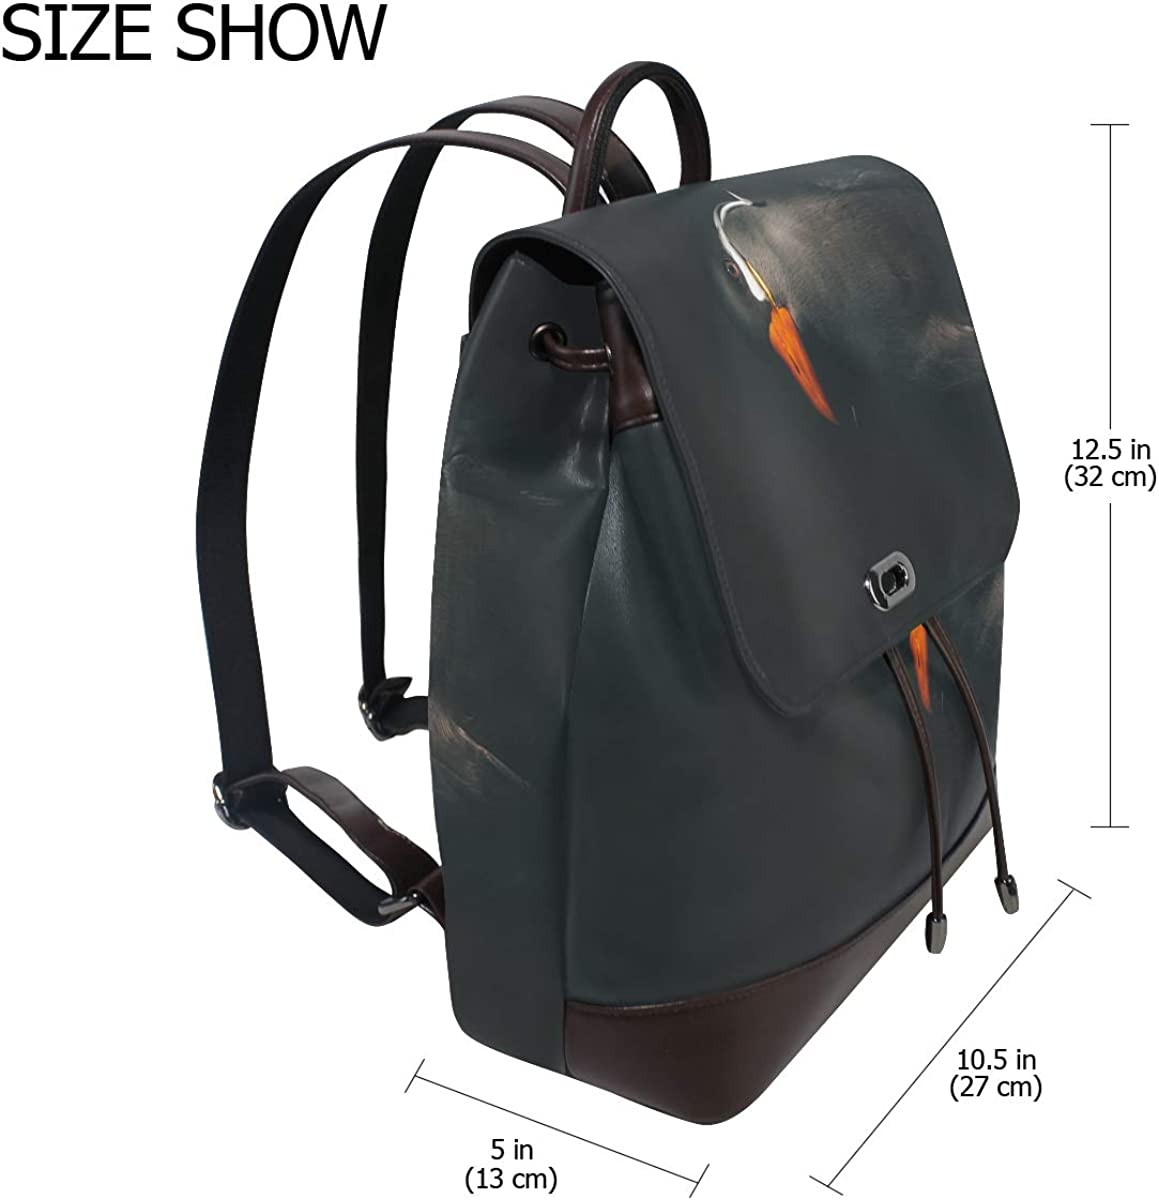 PU Leather Shoulder Bag,Penguine Art Backpack,Portable Travel School Rucksack,Satchel with Top Handle